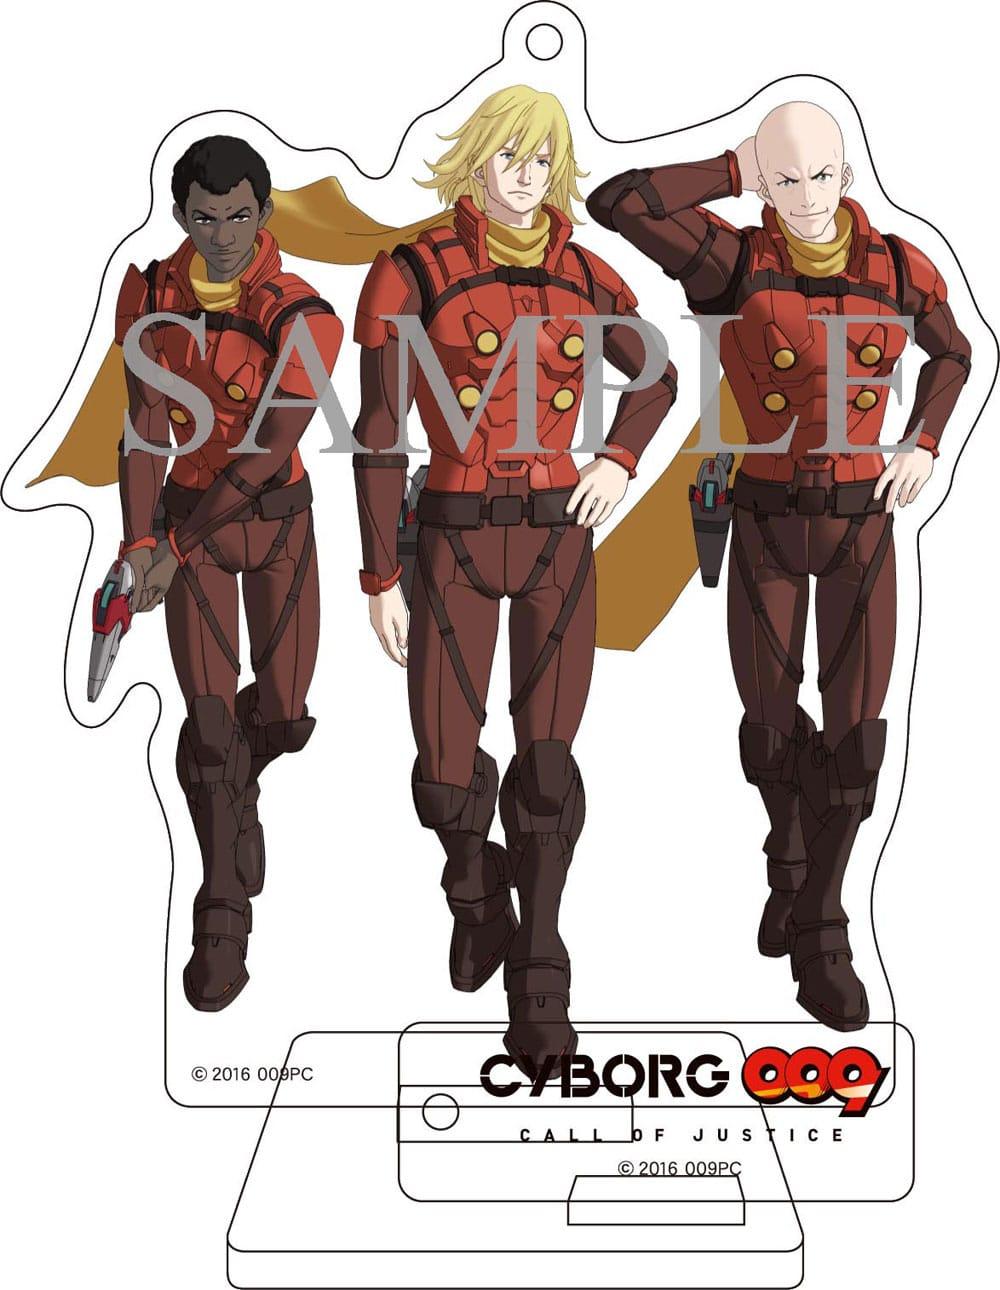 【TOHO animation STORE 限定版】CYBORG009 CALL OF JUSTICE Vol.2 Blu-ray 初回生産限定版+オリジナルアクリルスタンディセット